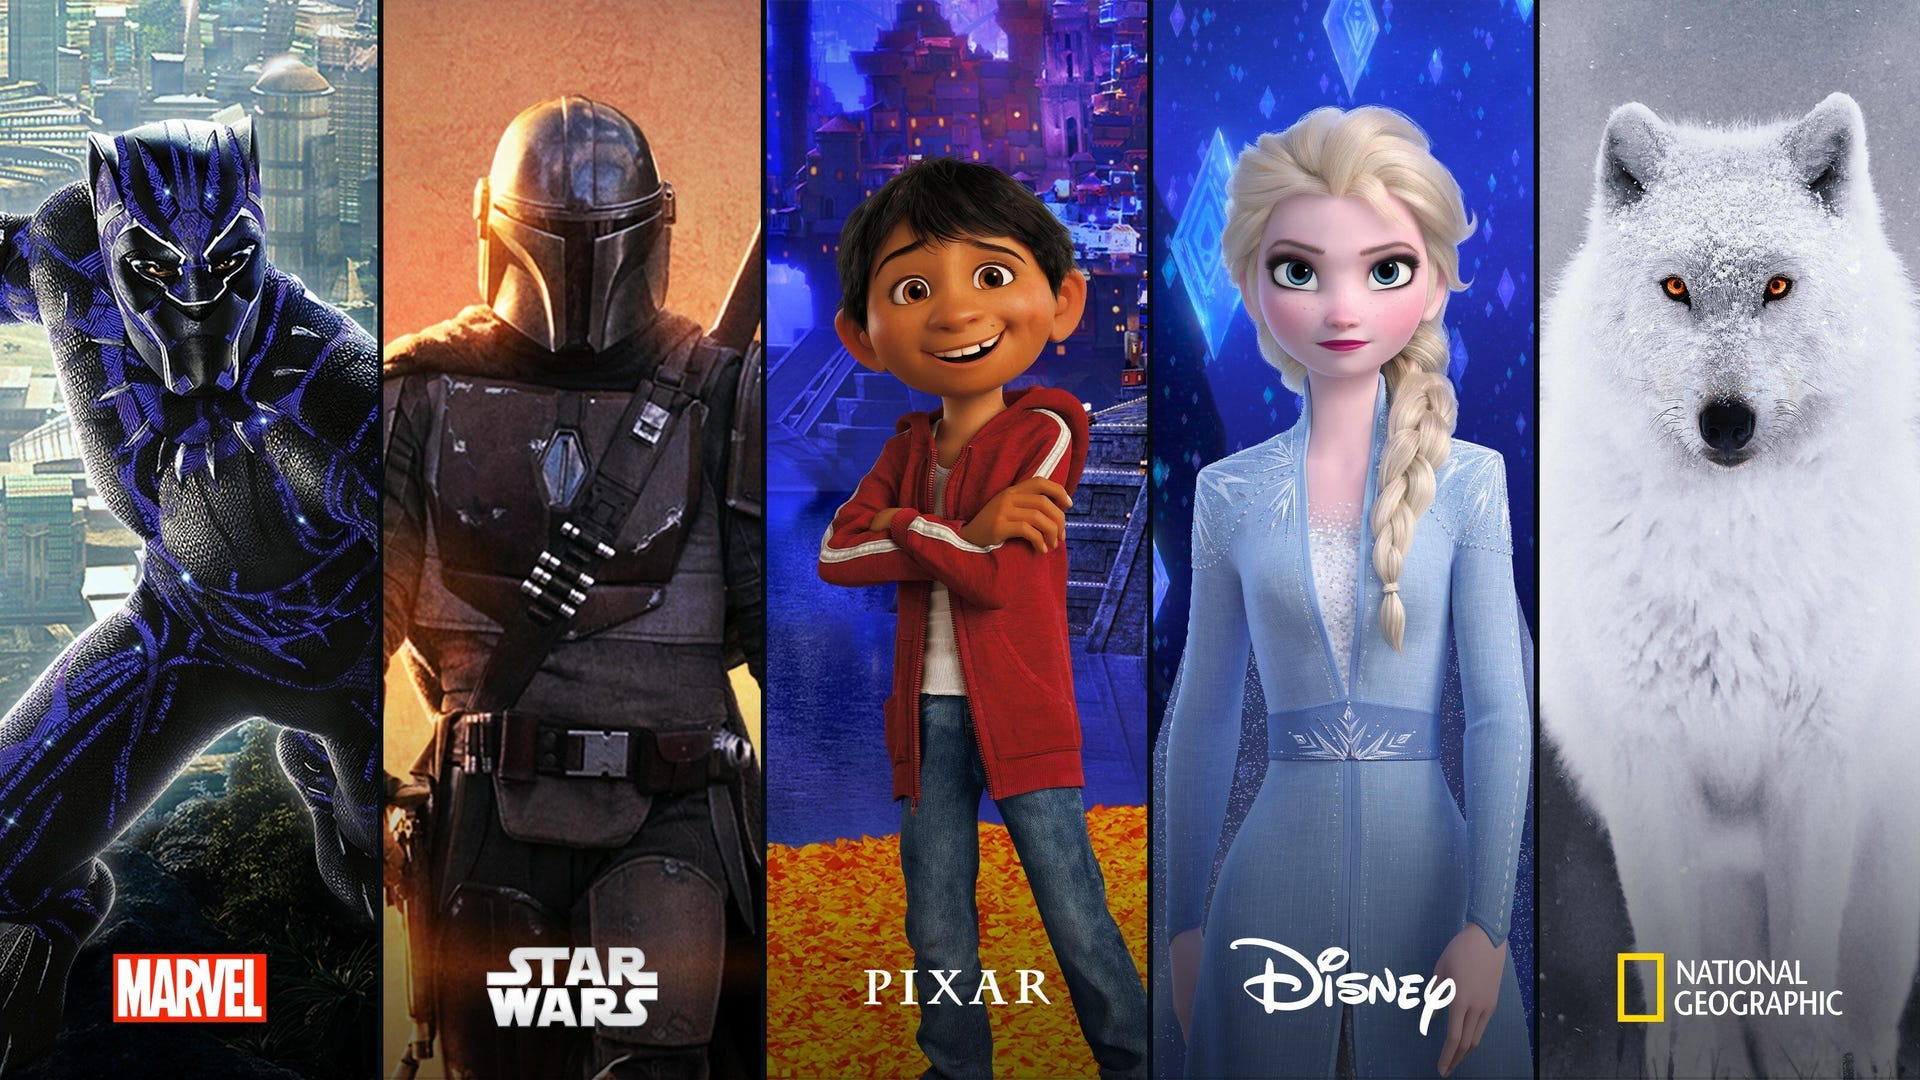 Disney Plus programming: Marvel, Star Wars, Pixar, Disney, National Geographic